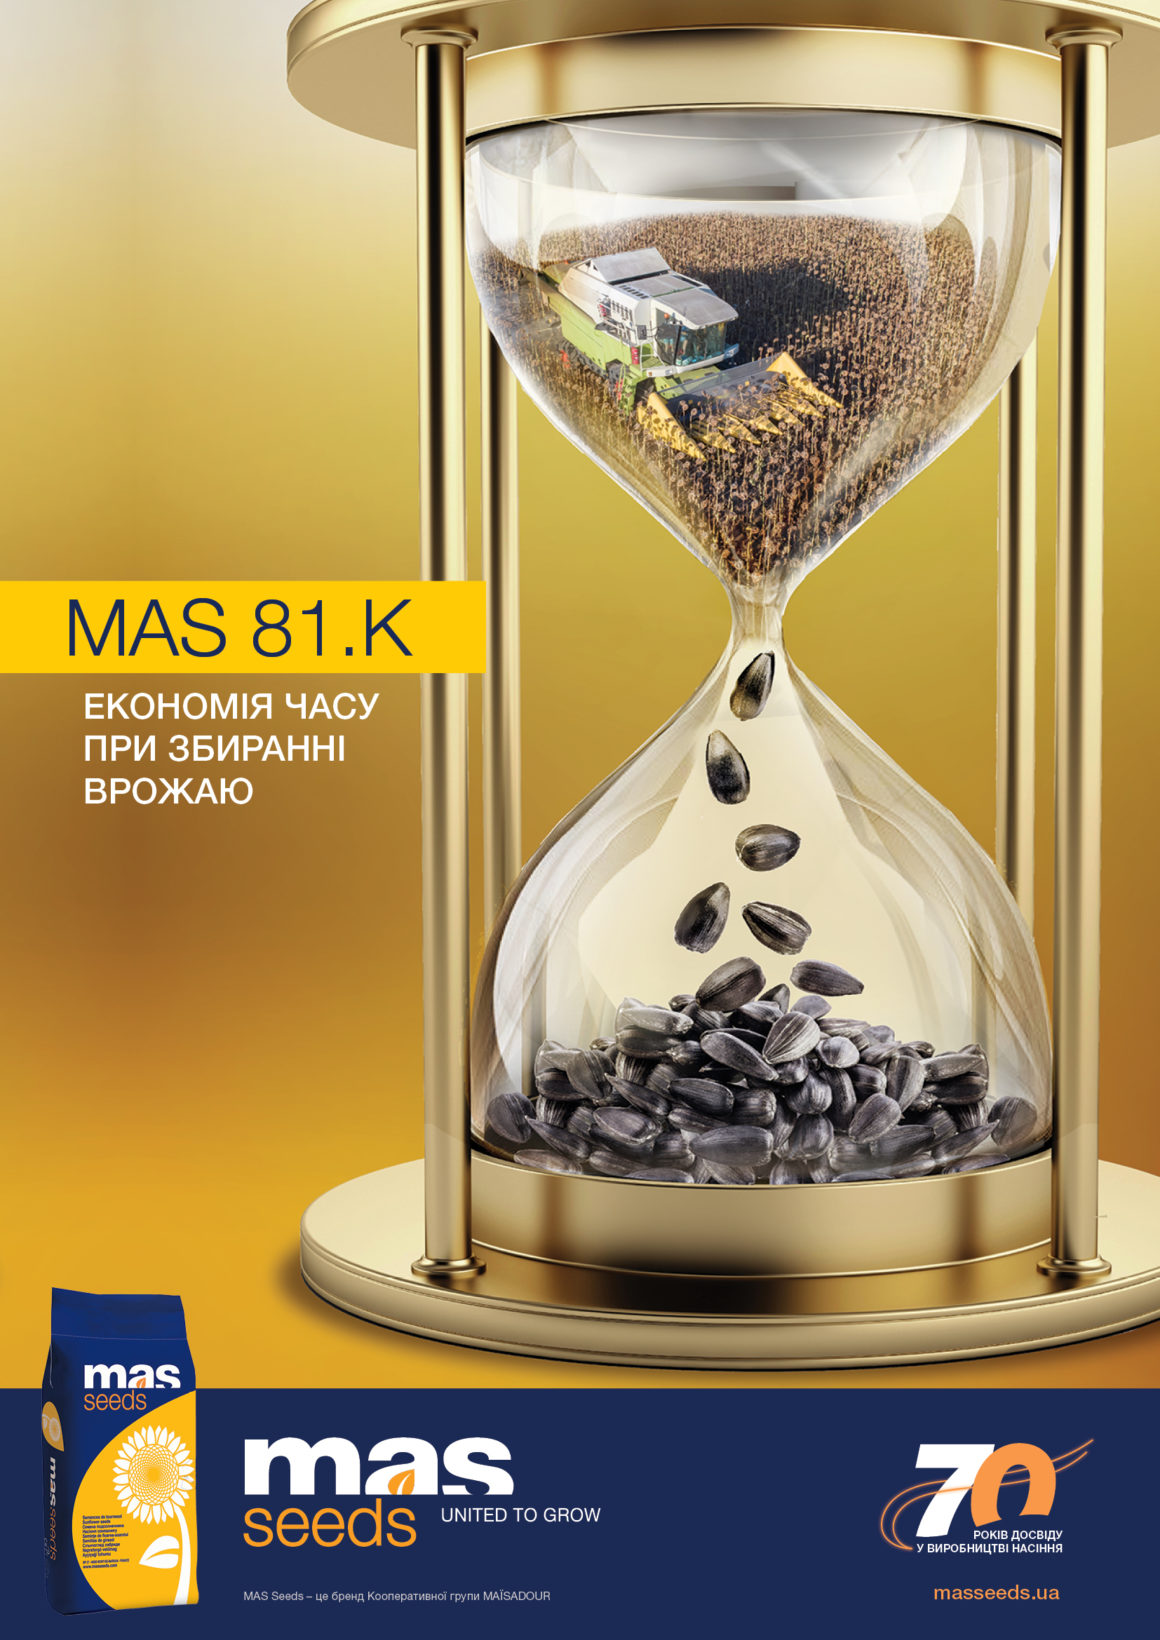 MAS 81.K